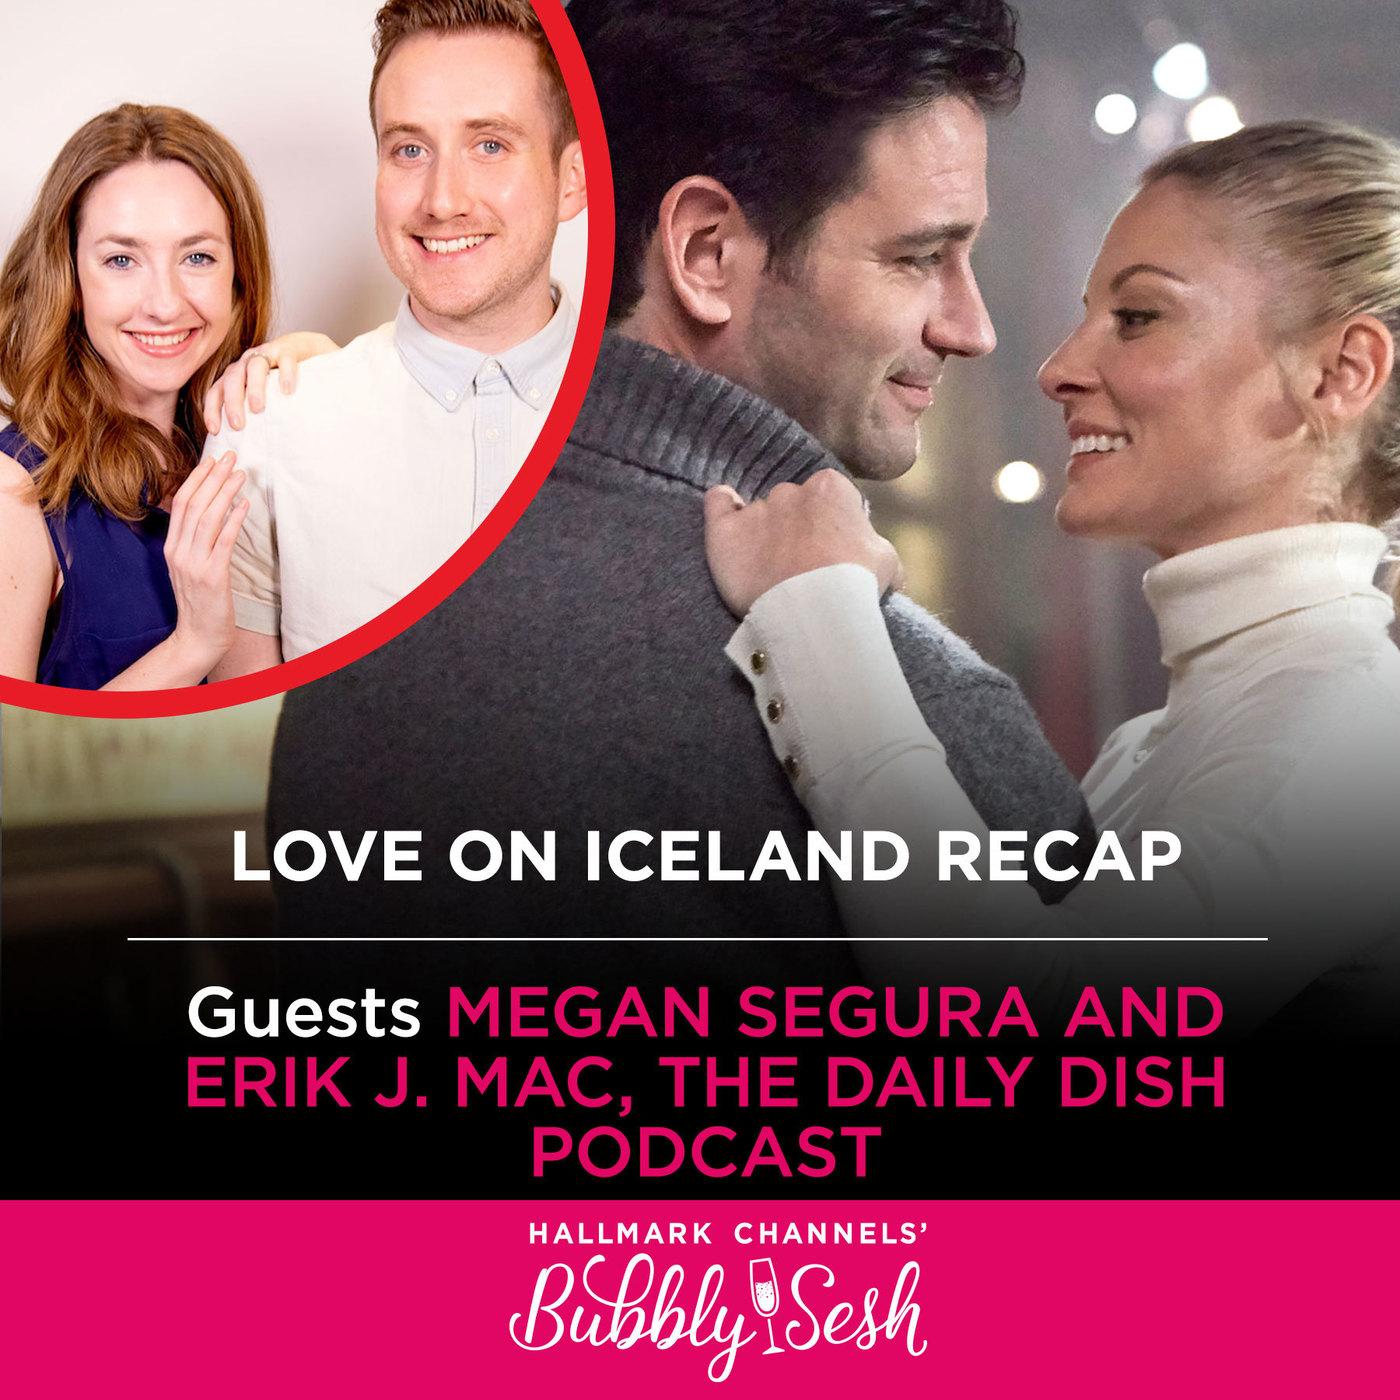 Love on Iceland Recap with Megan Segura and Erik J. Mac, Bravo Daily Dish Podcast